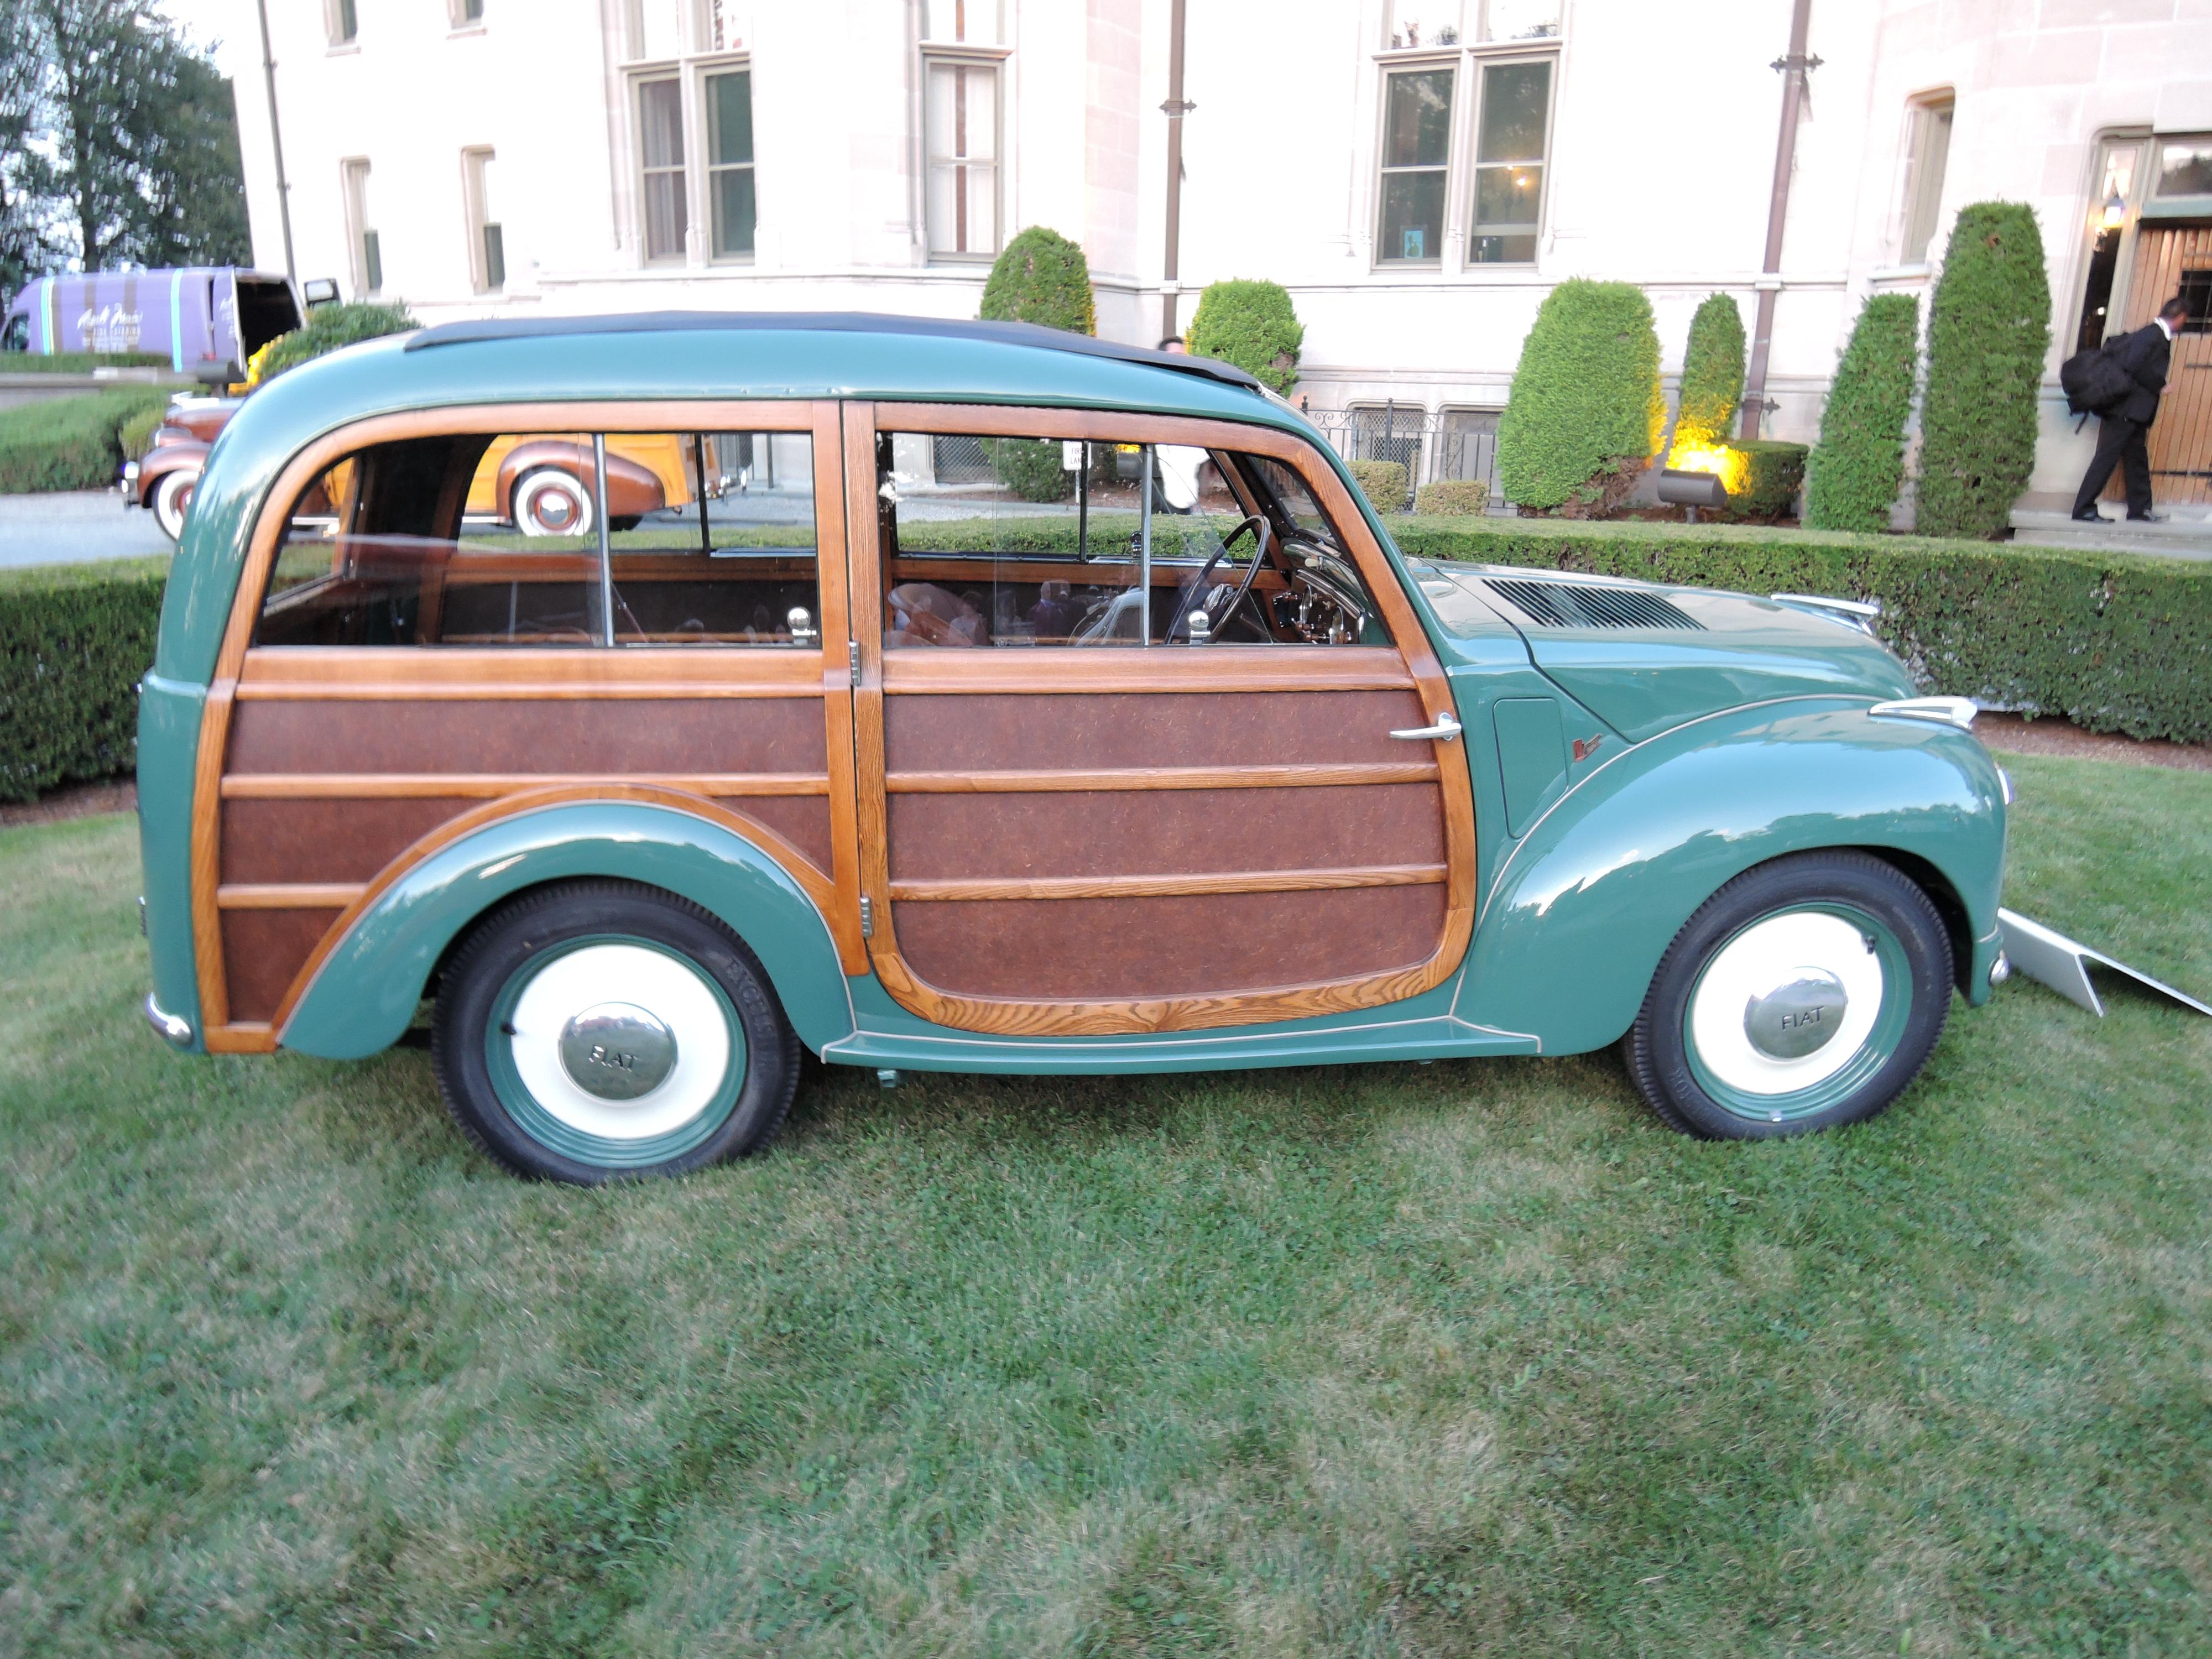 green/wood 1951 Fiat 500C Giardiniera - Audrain Auto Museum Gala 2017